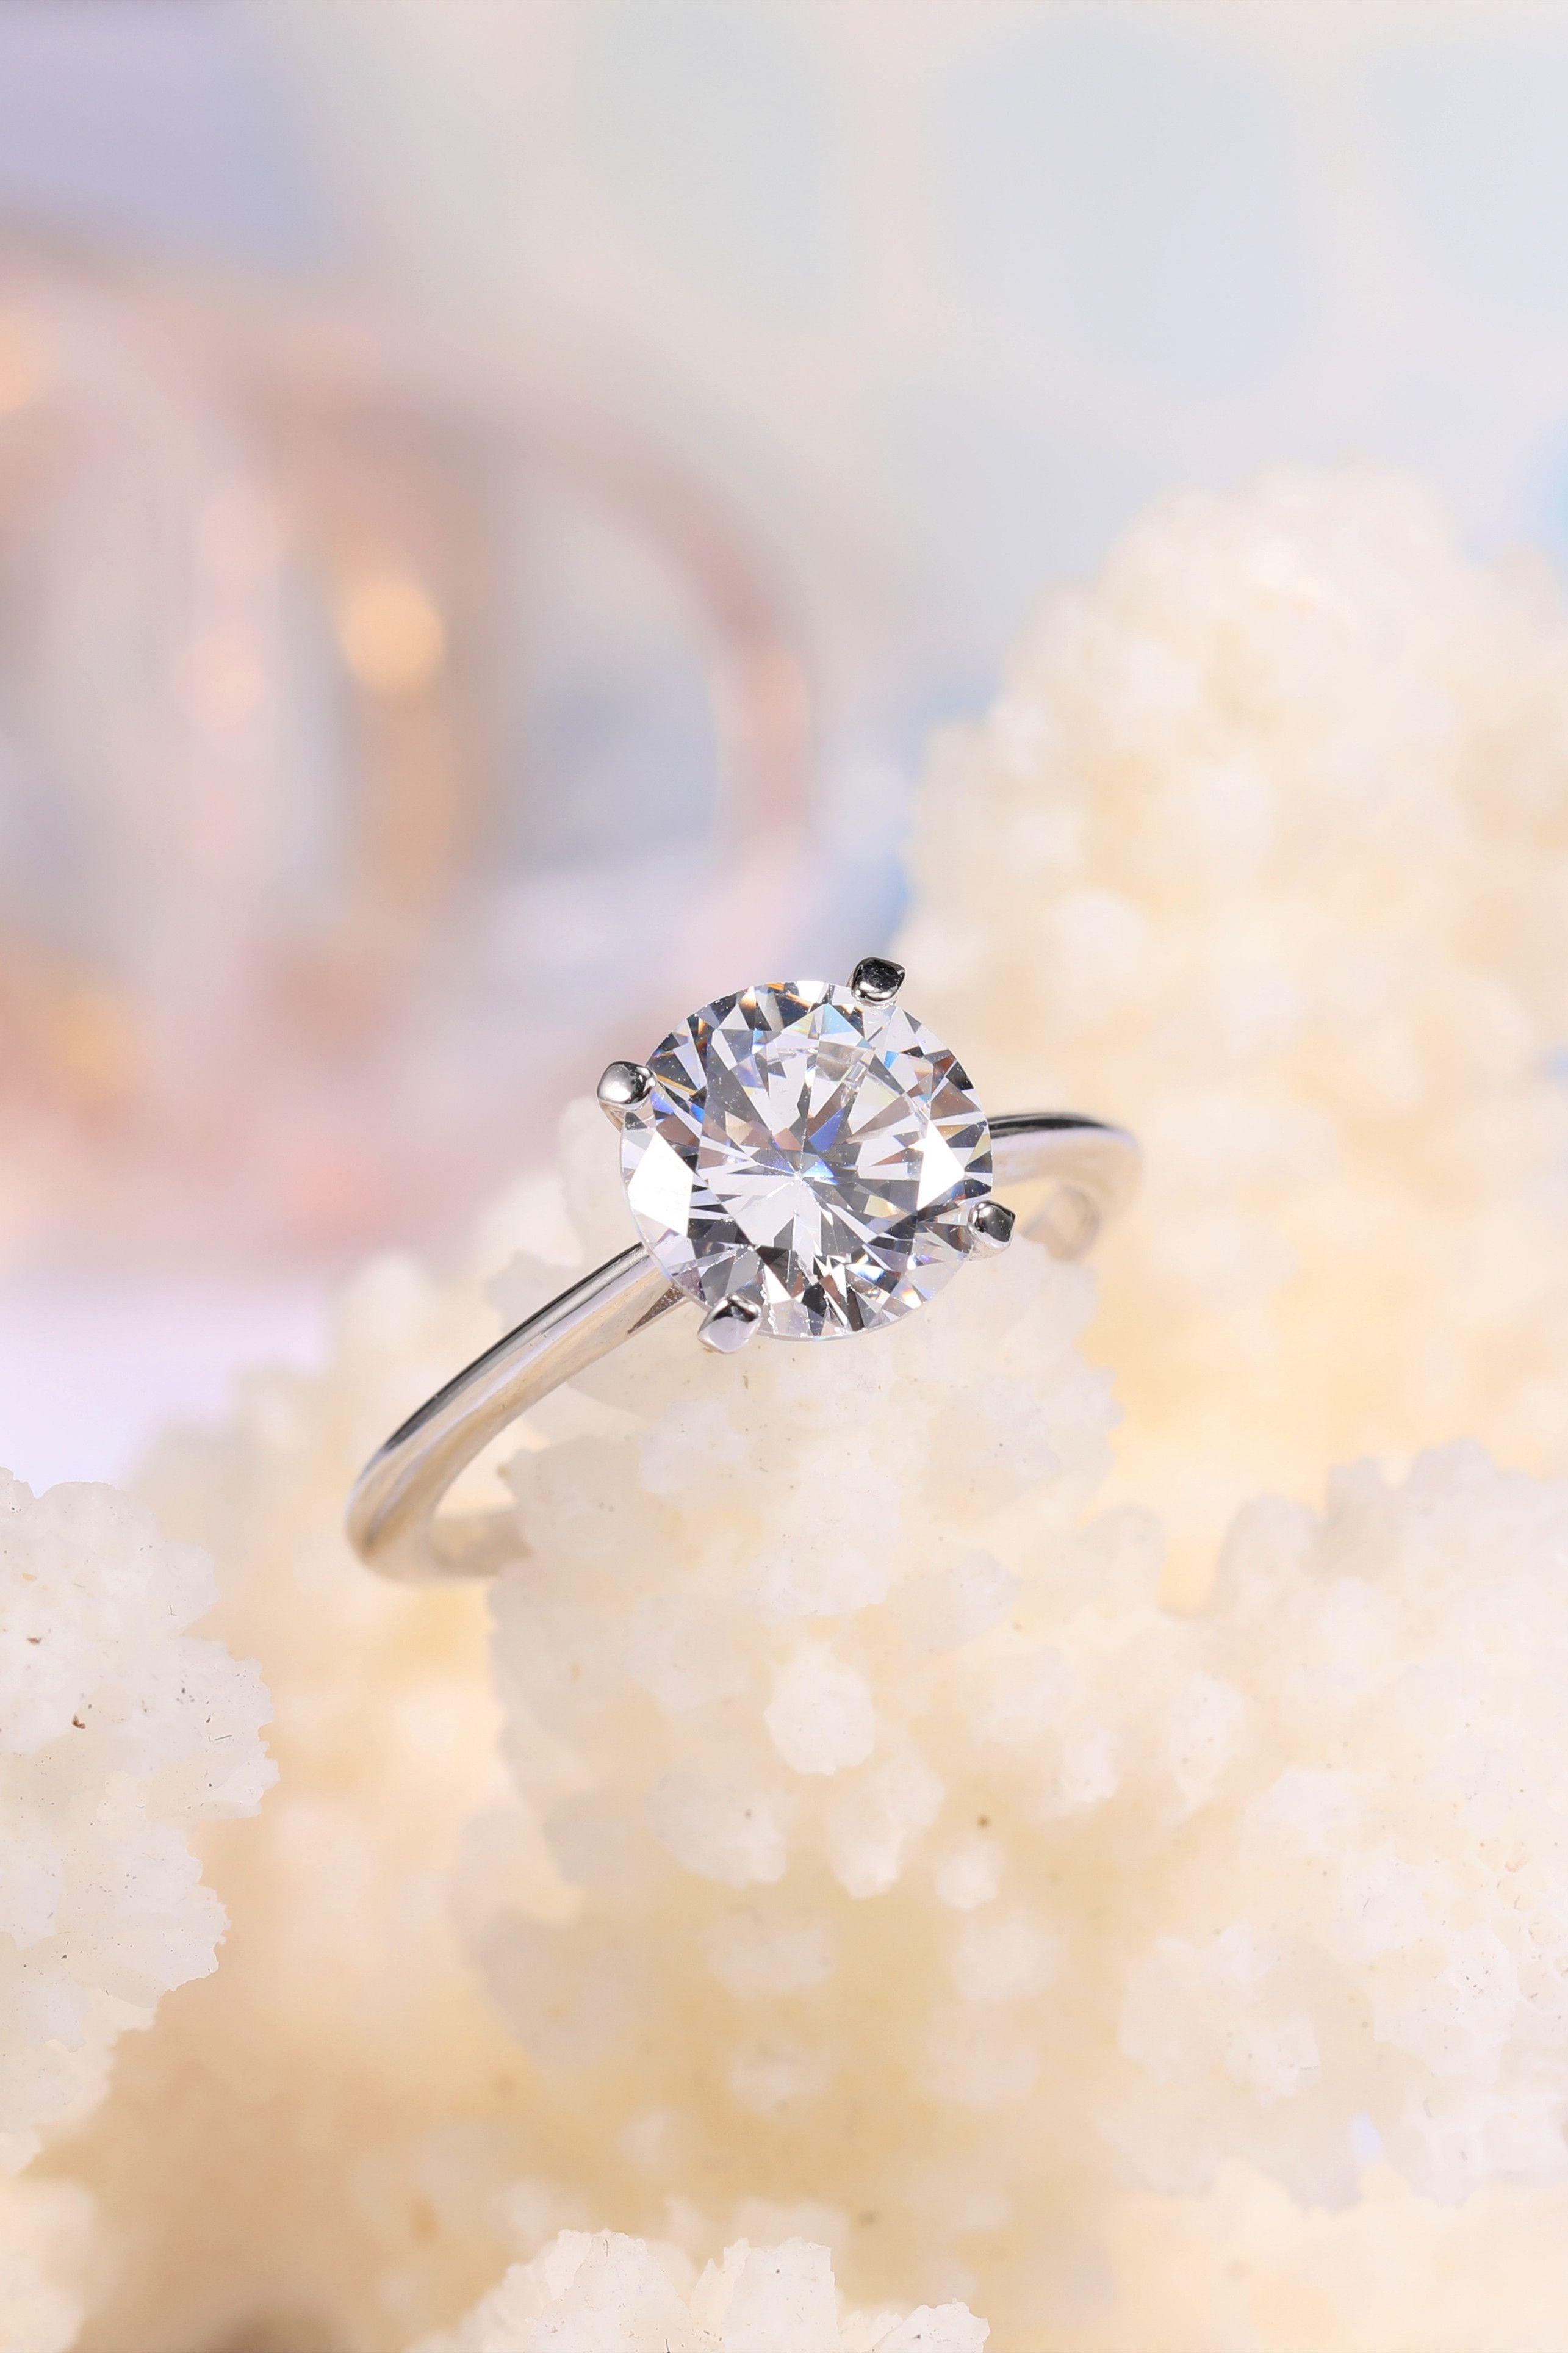 Cubic Zirconia Wedding Rings Sterling Silver Four Claws Cubic Zirconia Wedding Rings Wedding Rings For Women Sterling Silver Wedding Rings